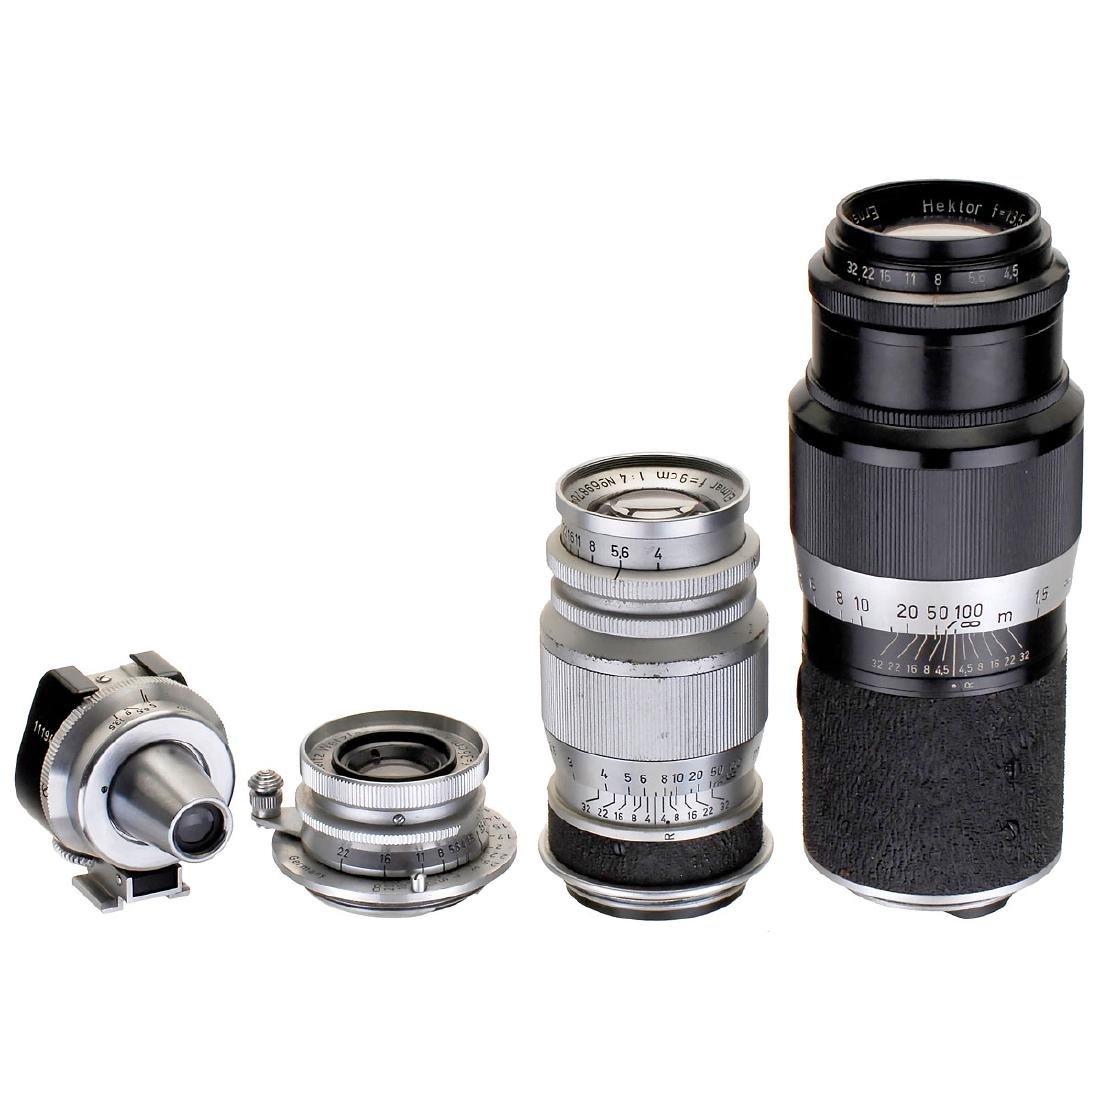 Leica Screw-Mount Lenses and Accessories - 2